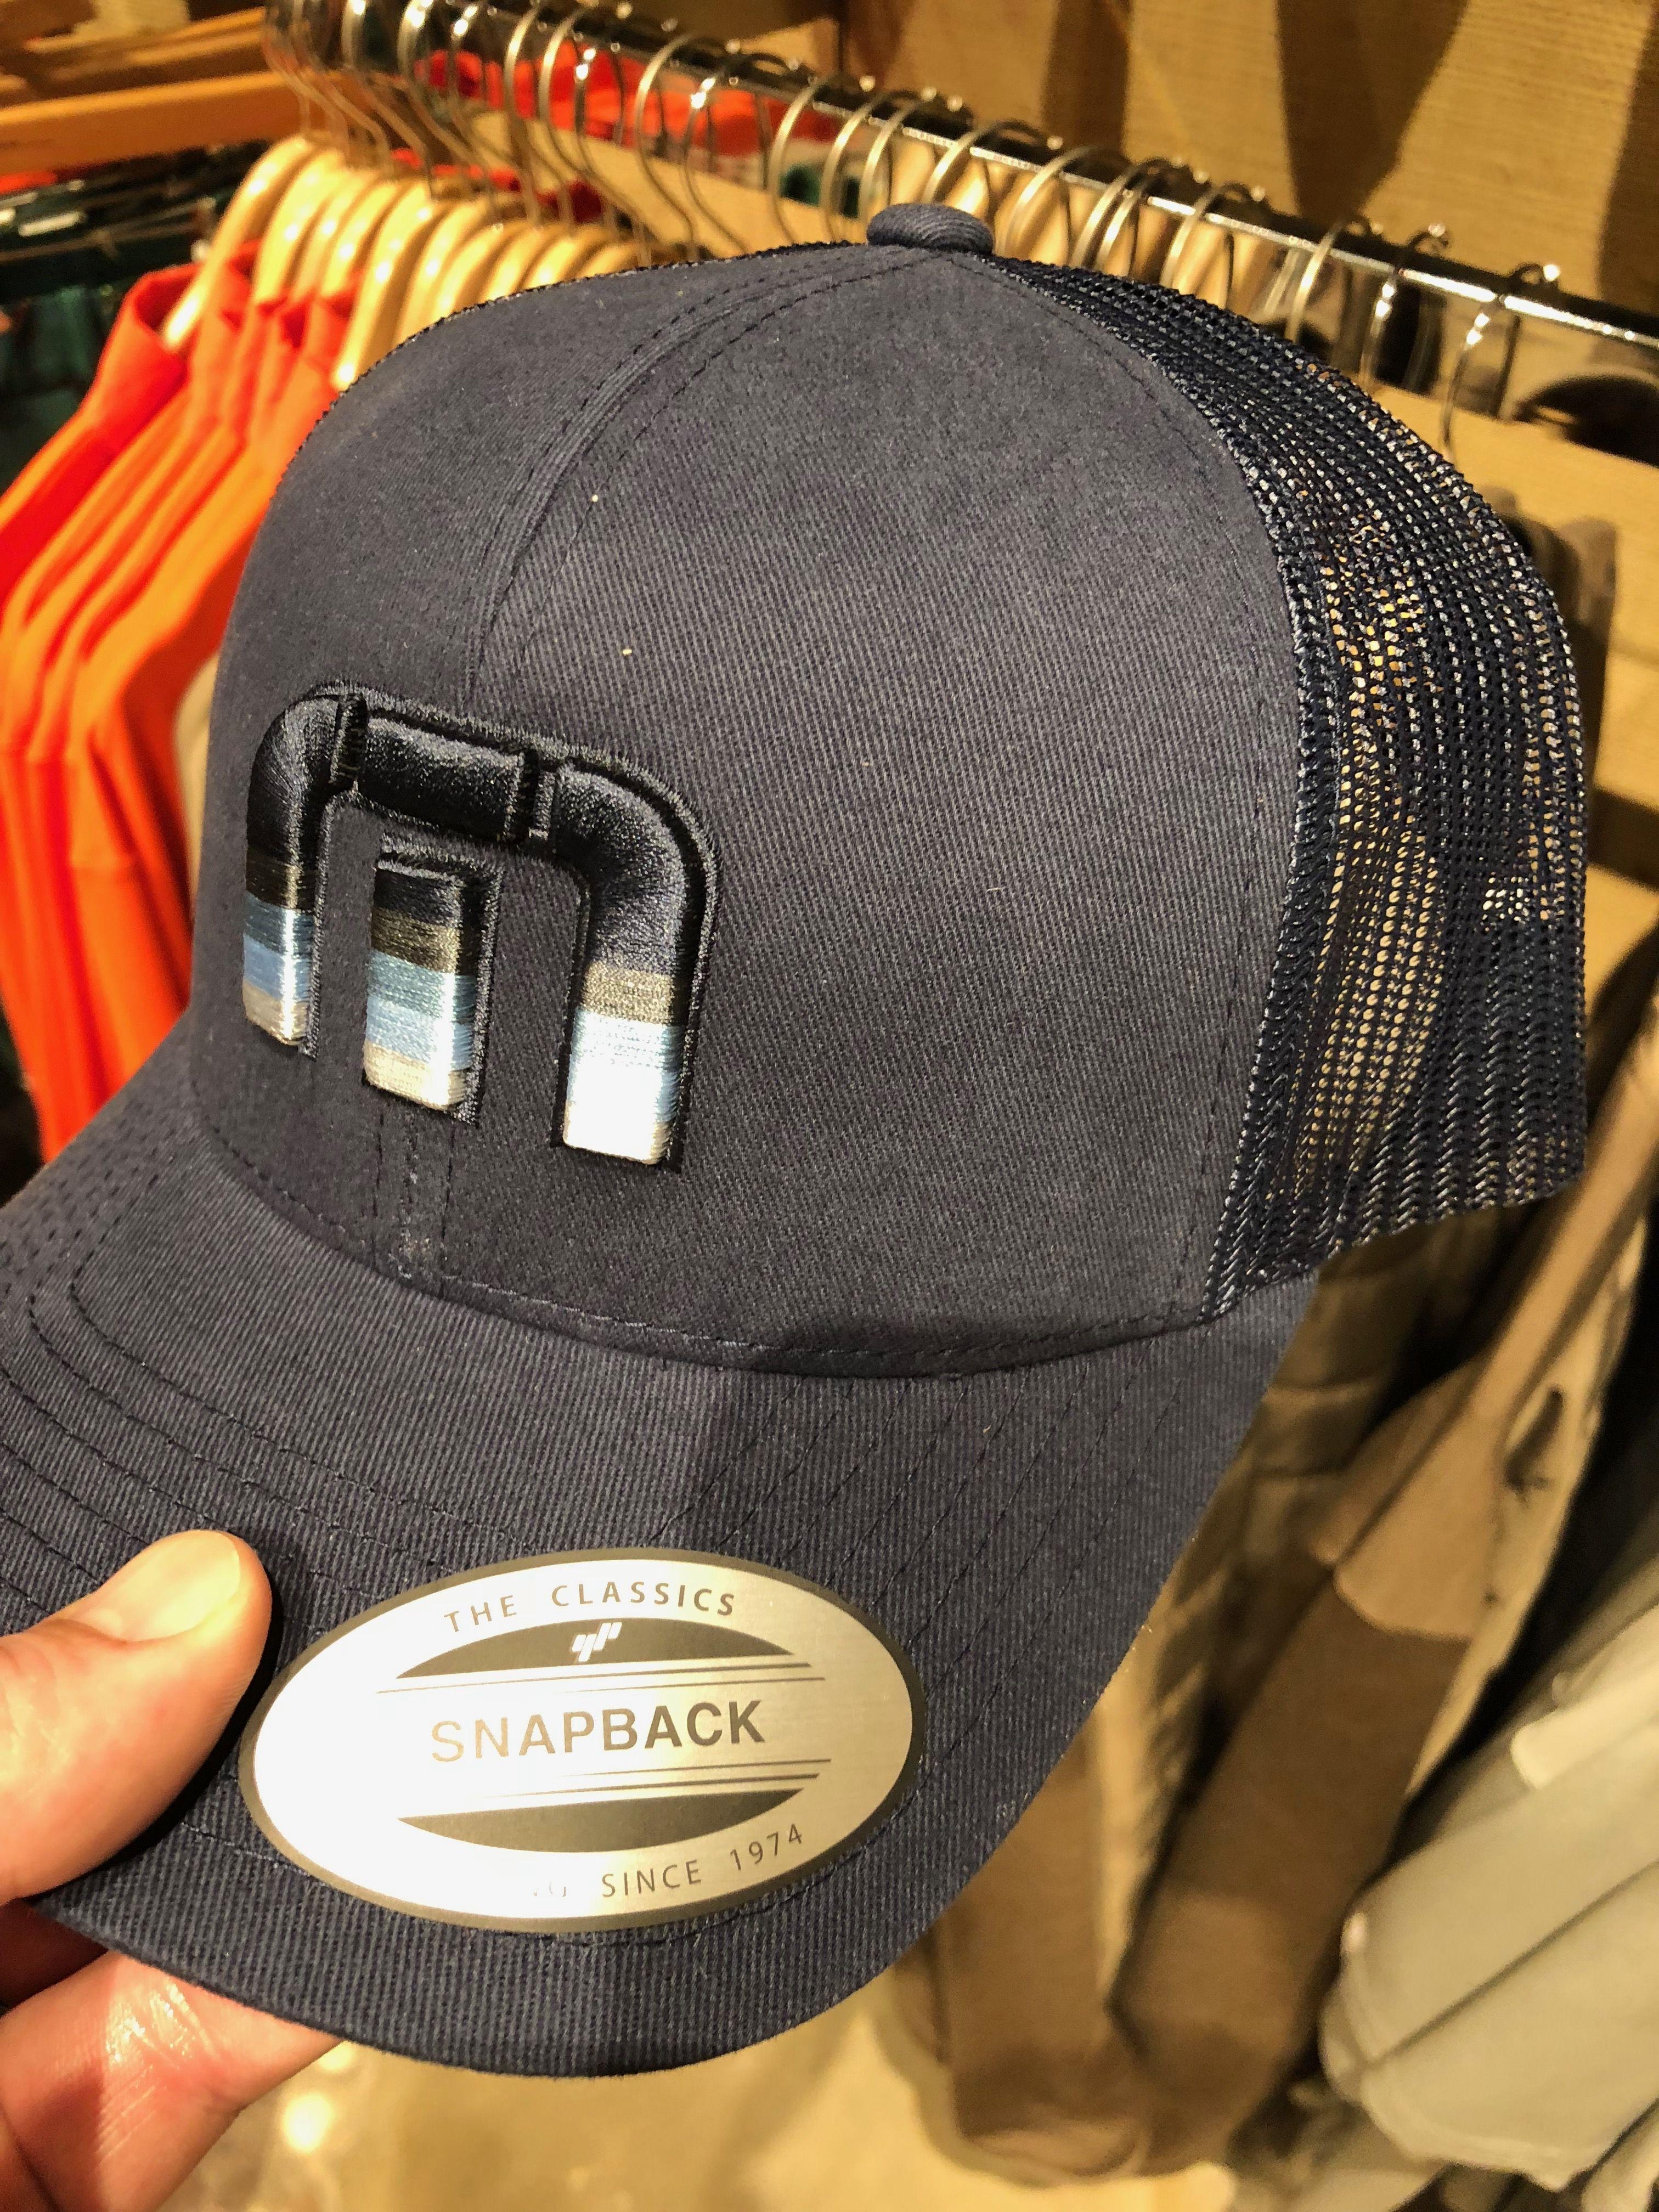 971bfa848ee8f TaylorMade New Era 9Fifty Snapback Hat - Men s Golf Hats   Headwear